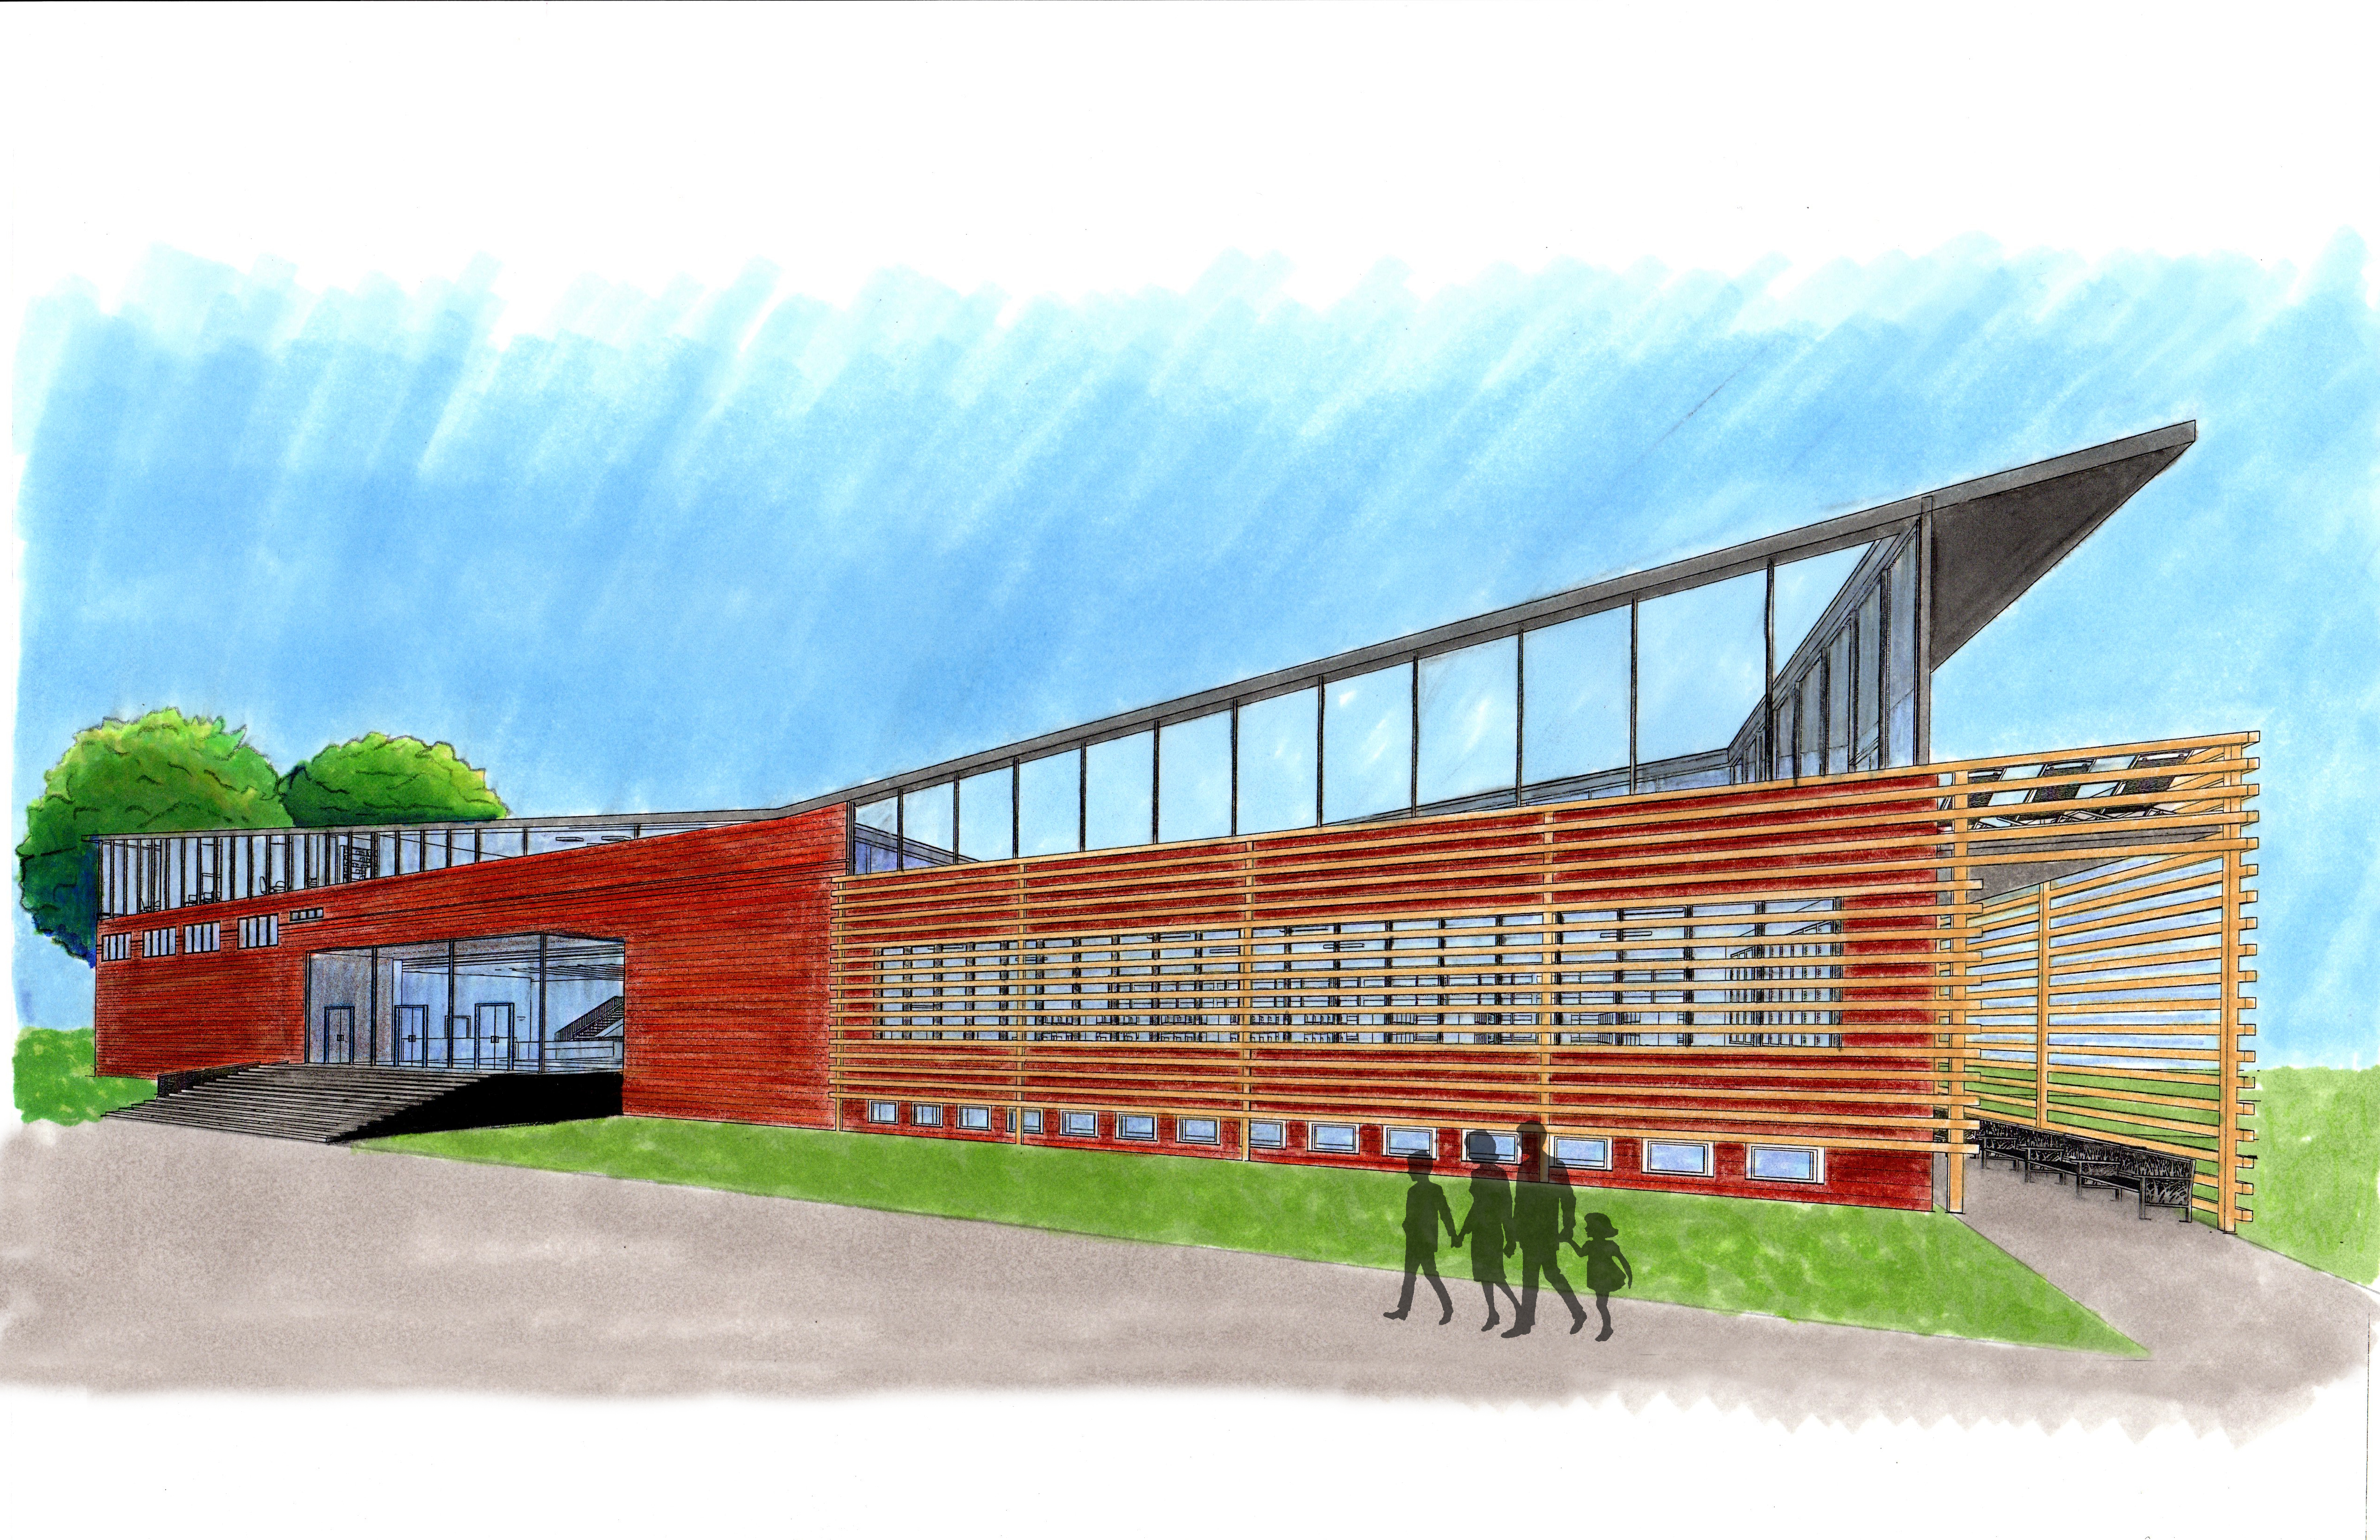 C.B. MOORE Recreation Center